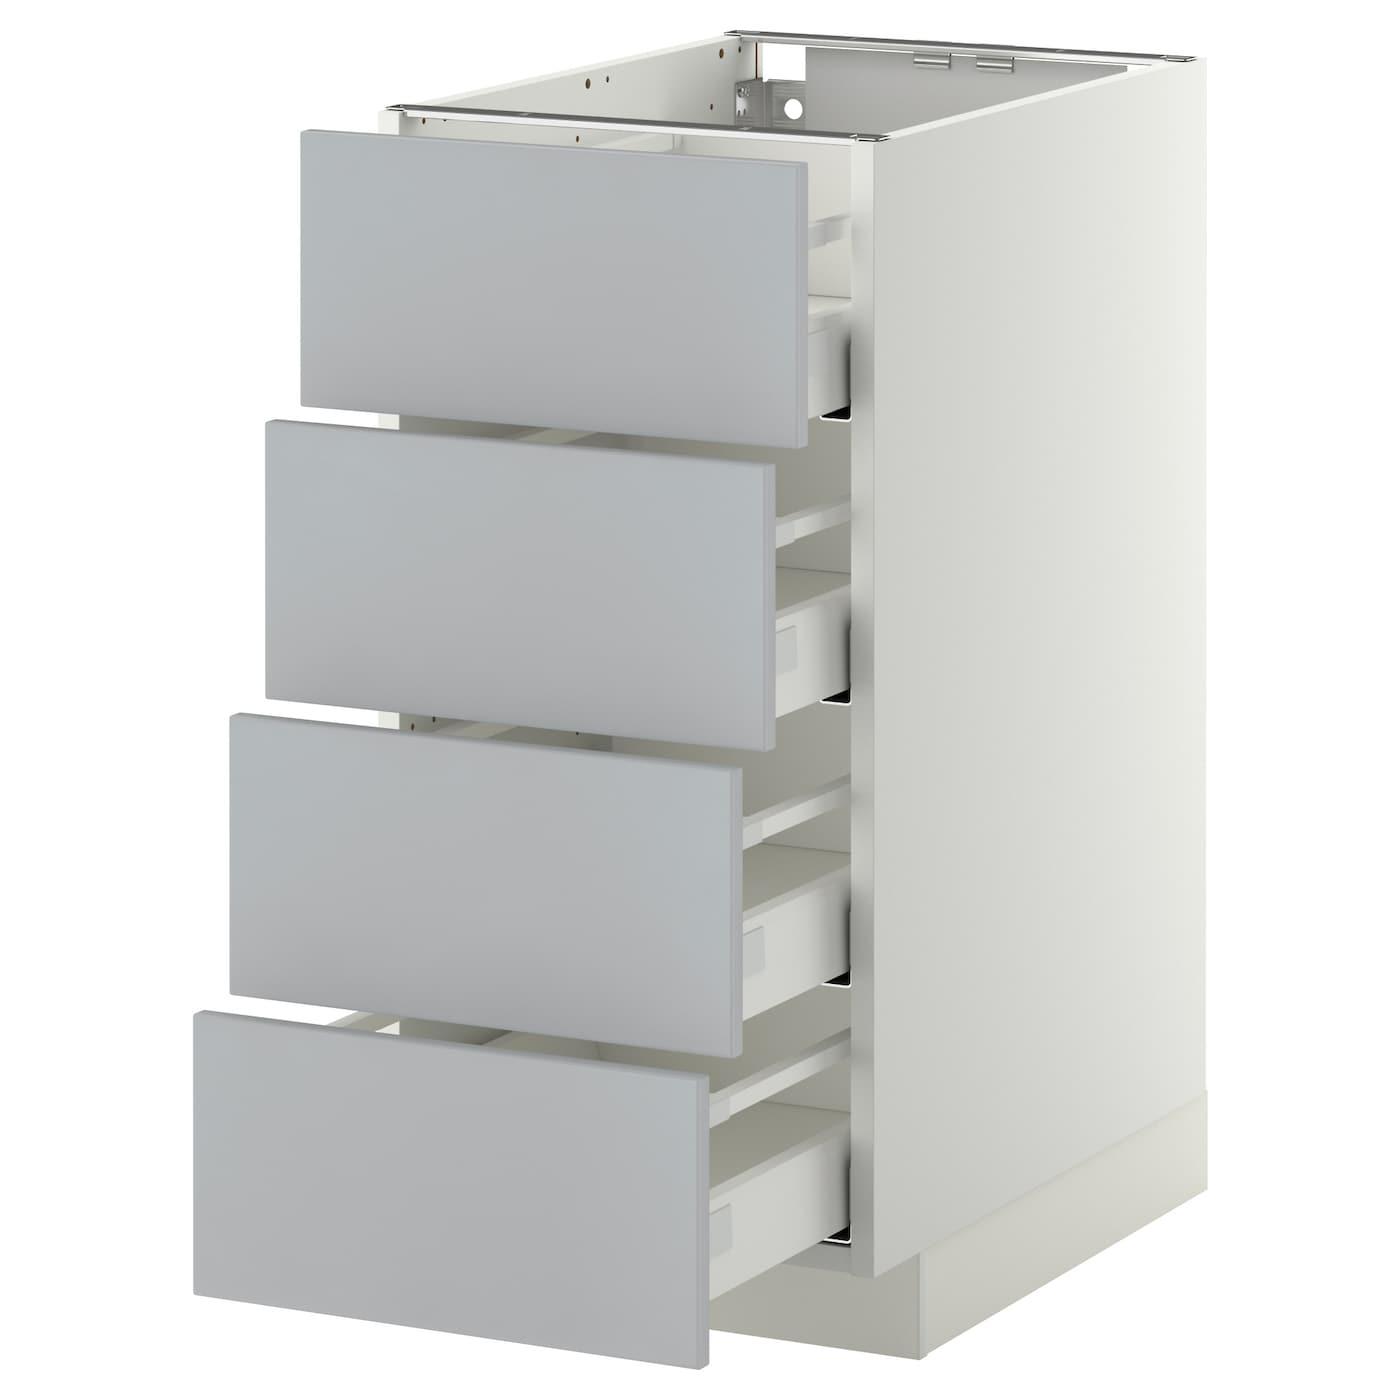 metod maximera base cab 4 frnts 4 drawers white veddinge grey 40x60 cm ikea. Black Bedroom Furniture Sets. Home Design Ideas